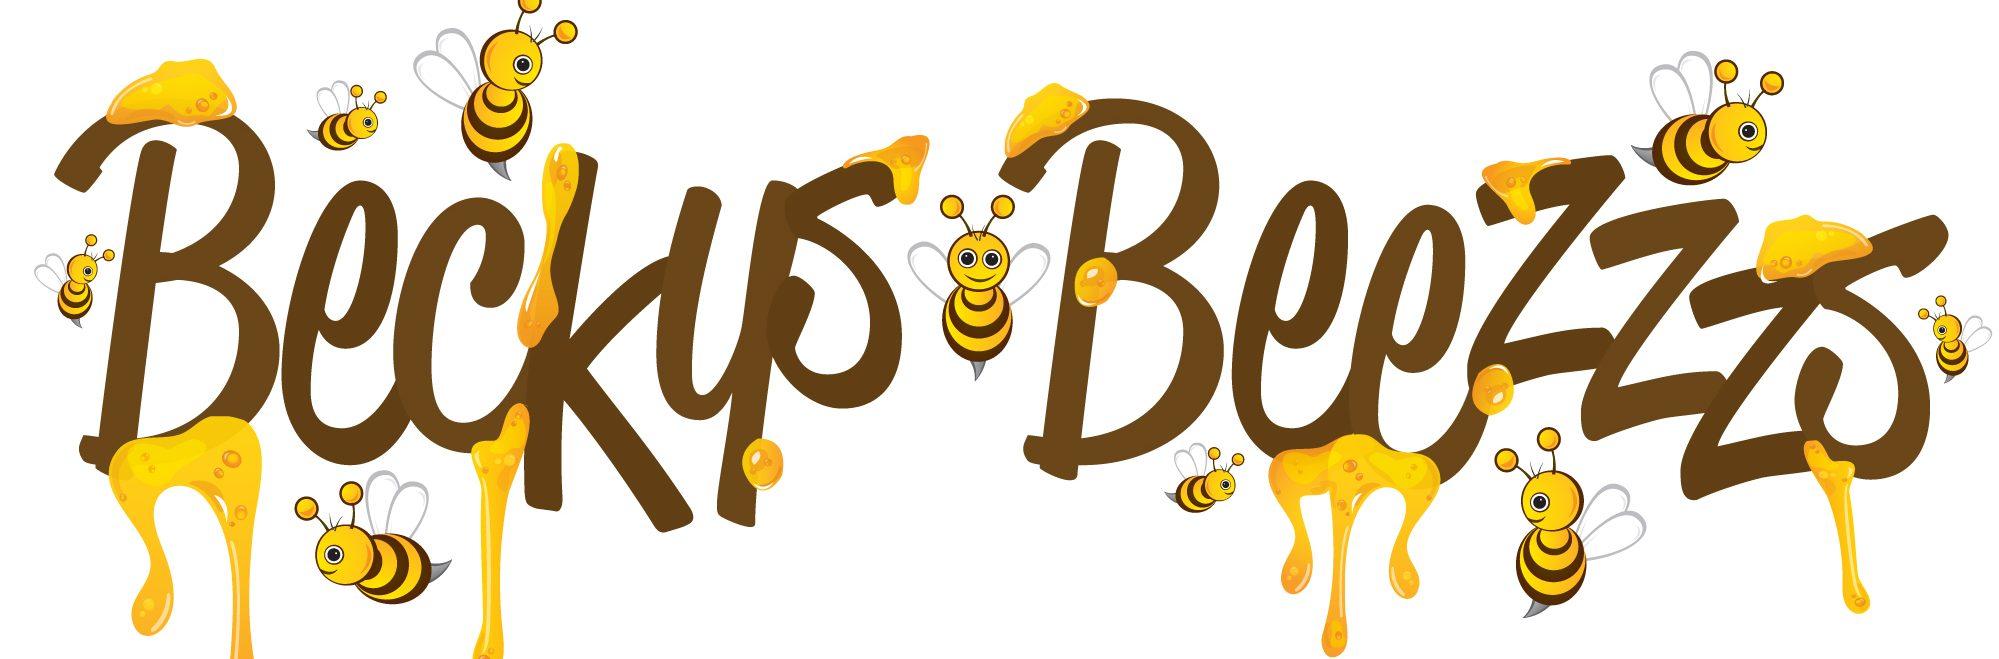 Beckys Beezzzs